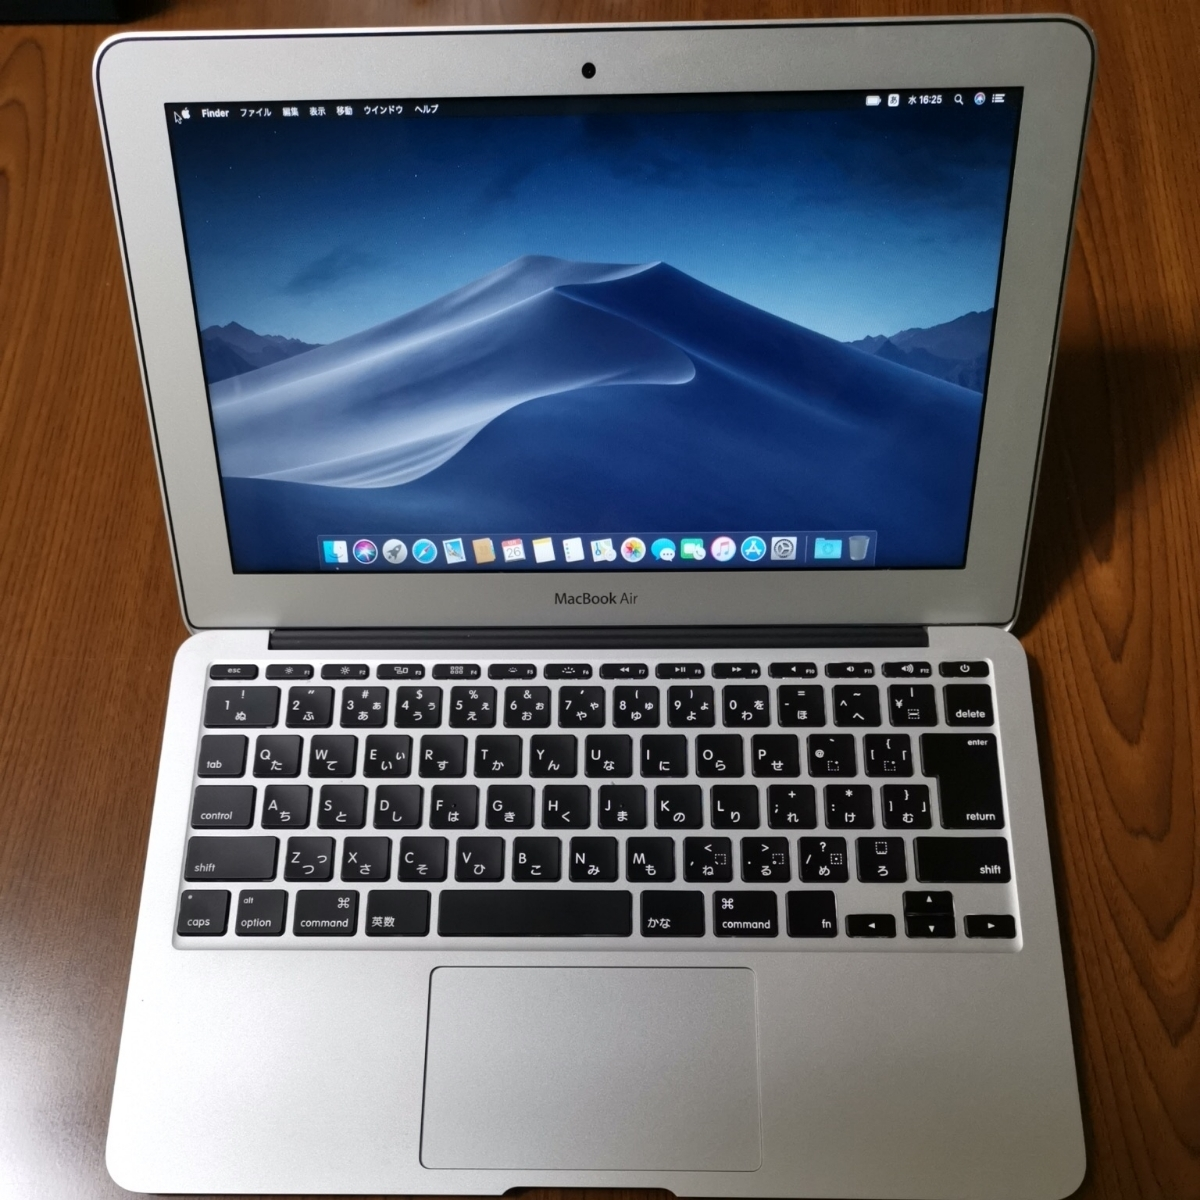 Apple MacBook Air 11インチ 2012 i5 4GB 128GB Mojave 動作確認済み 美品 Mac アップル SSD